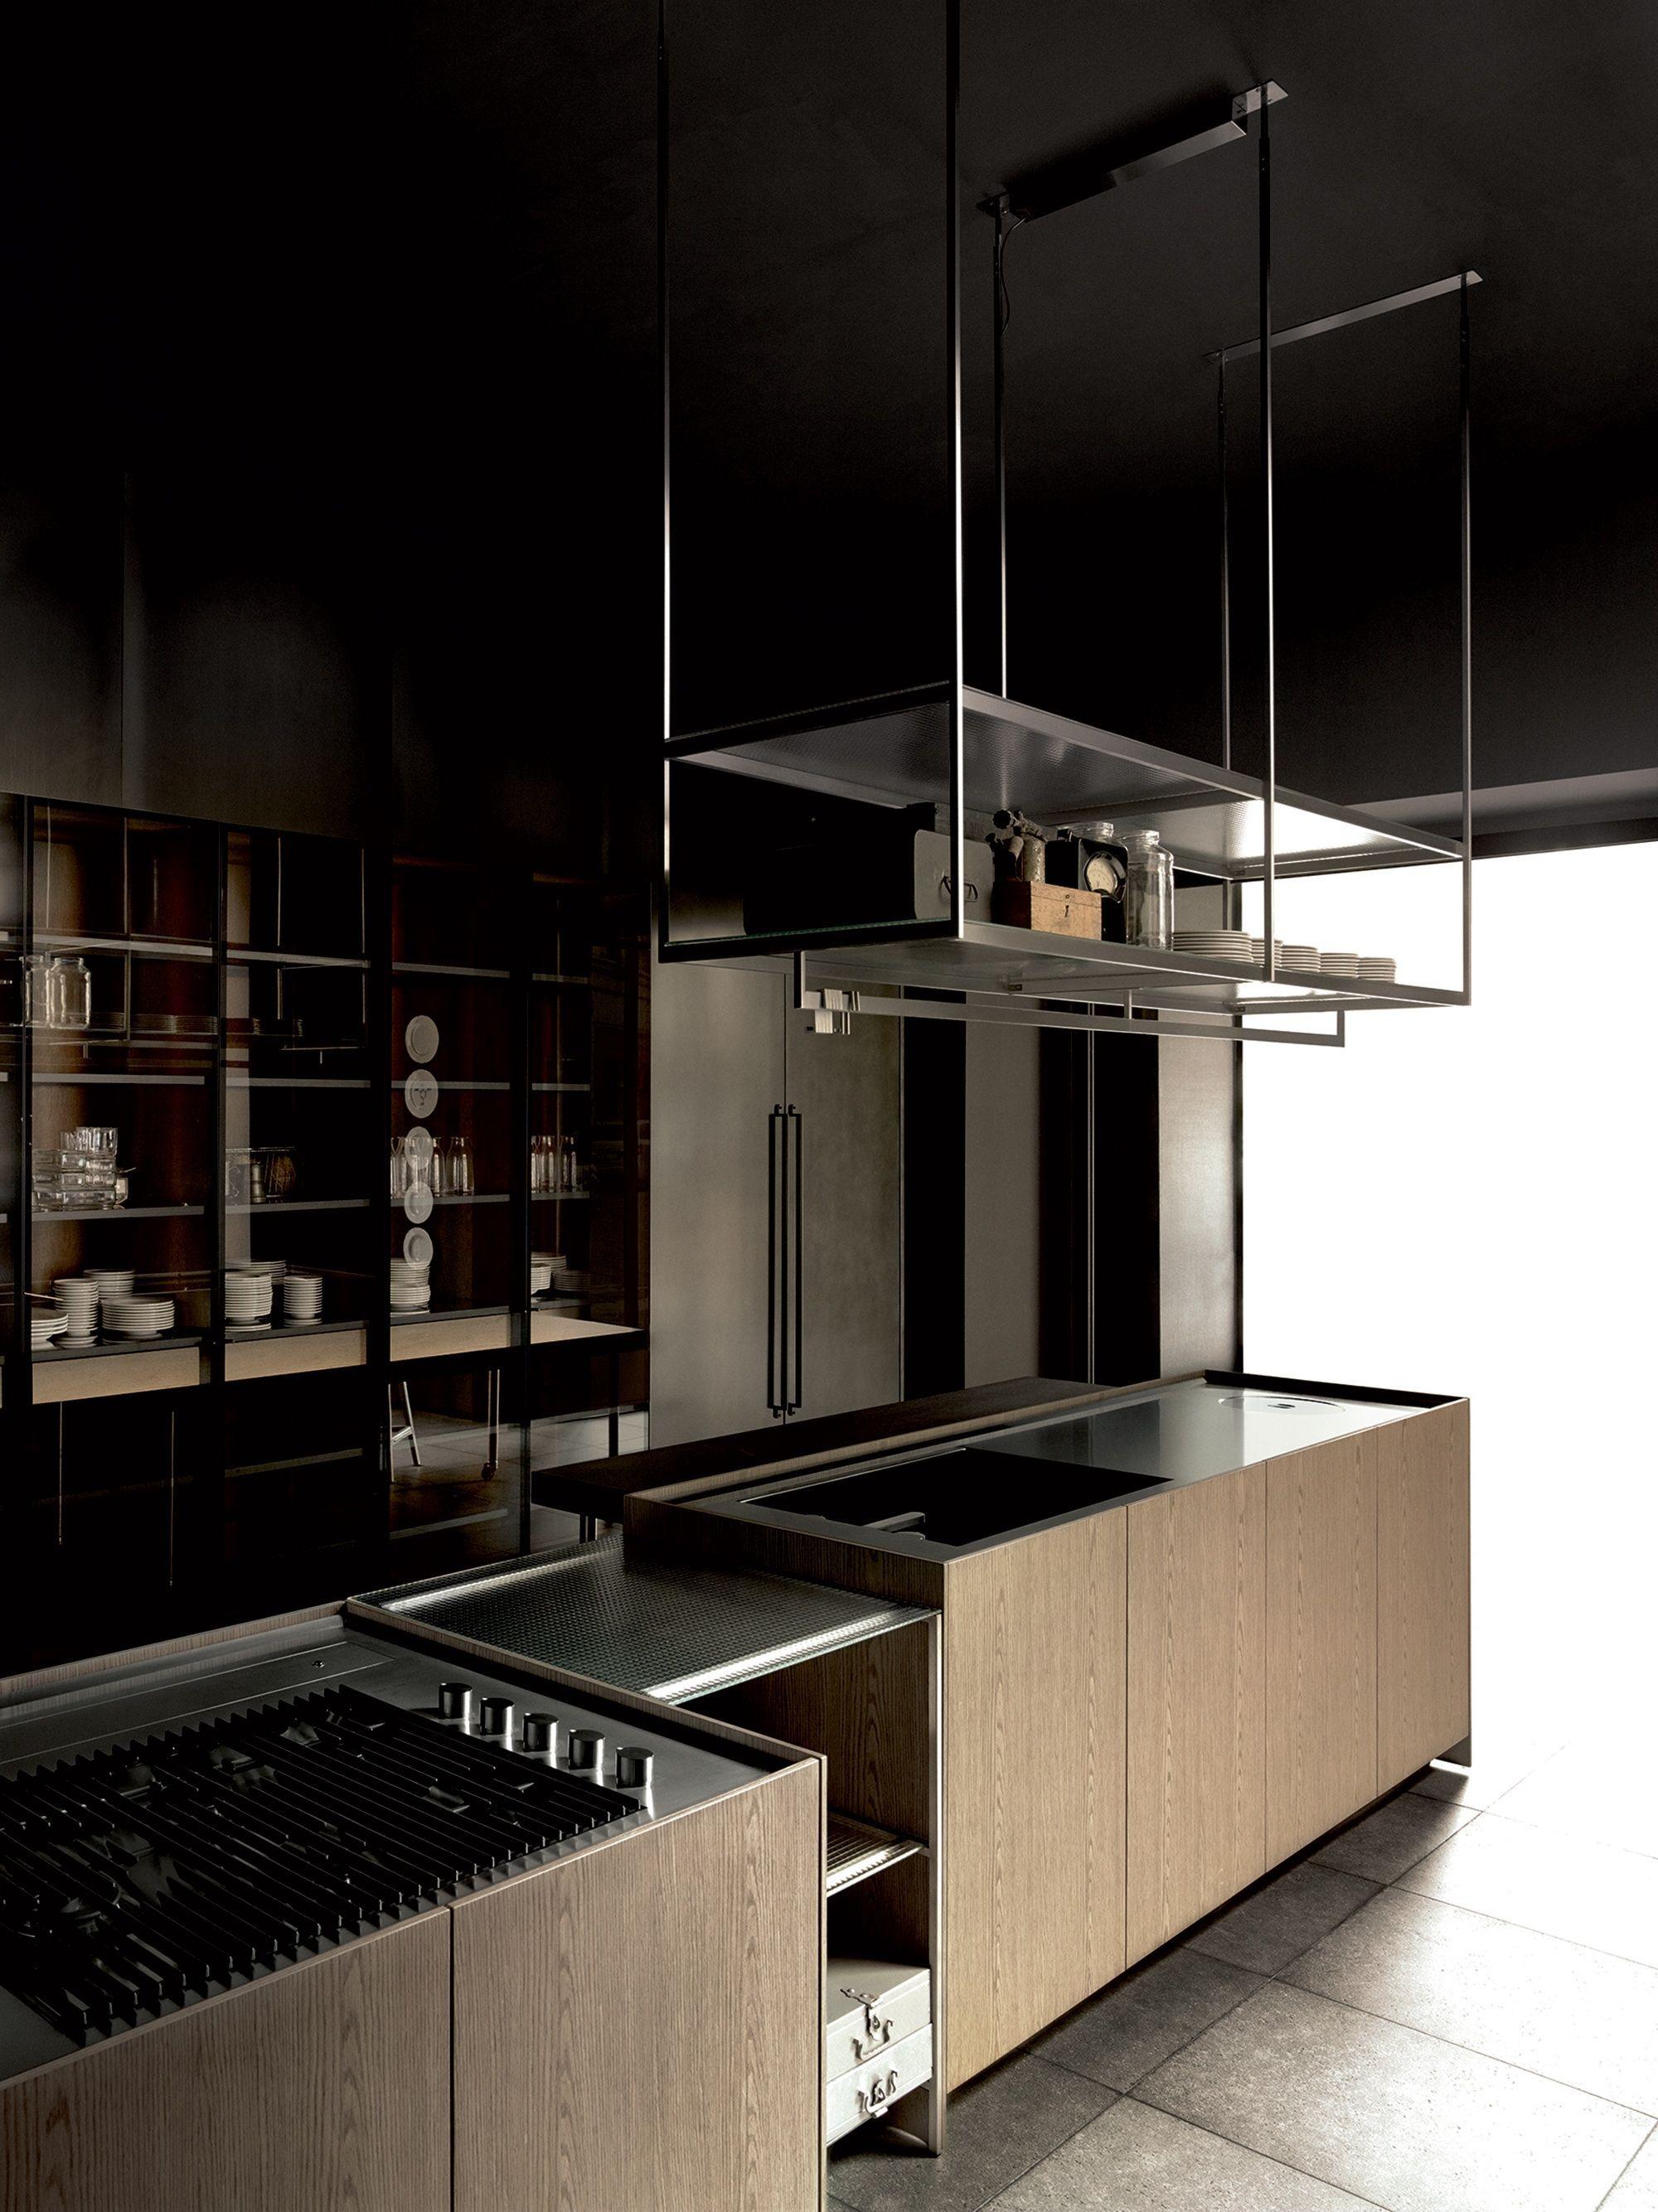 Boffi   Combine Kitchen / by Piero Lissoni / Ph. Tommaso Sartori   Traditional kitchen island ...